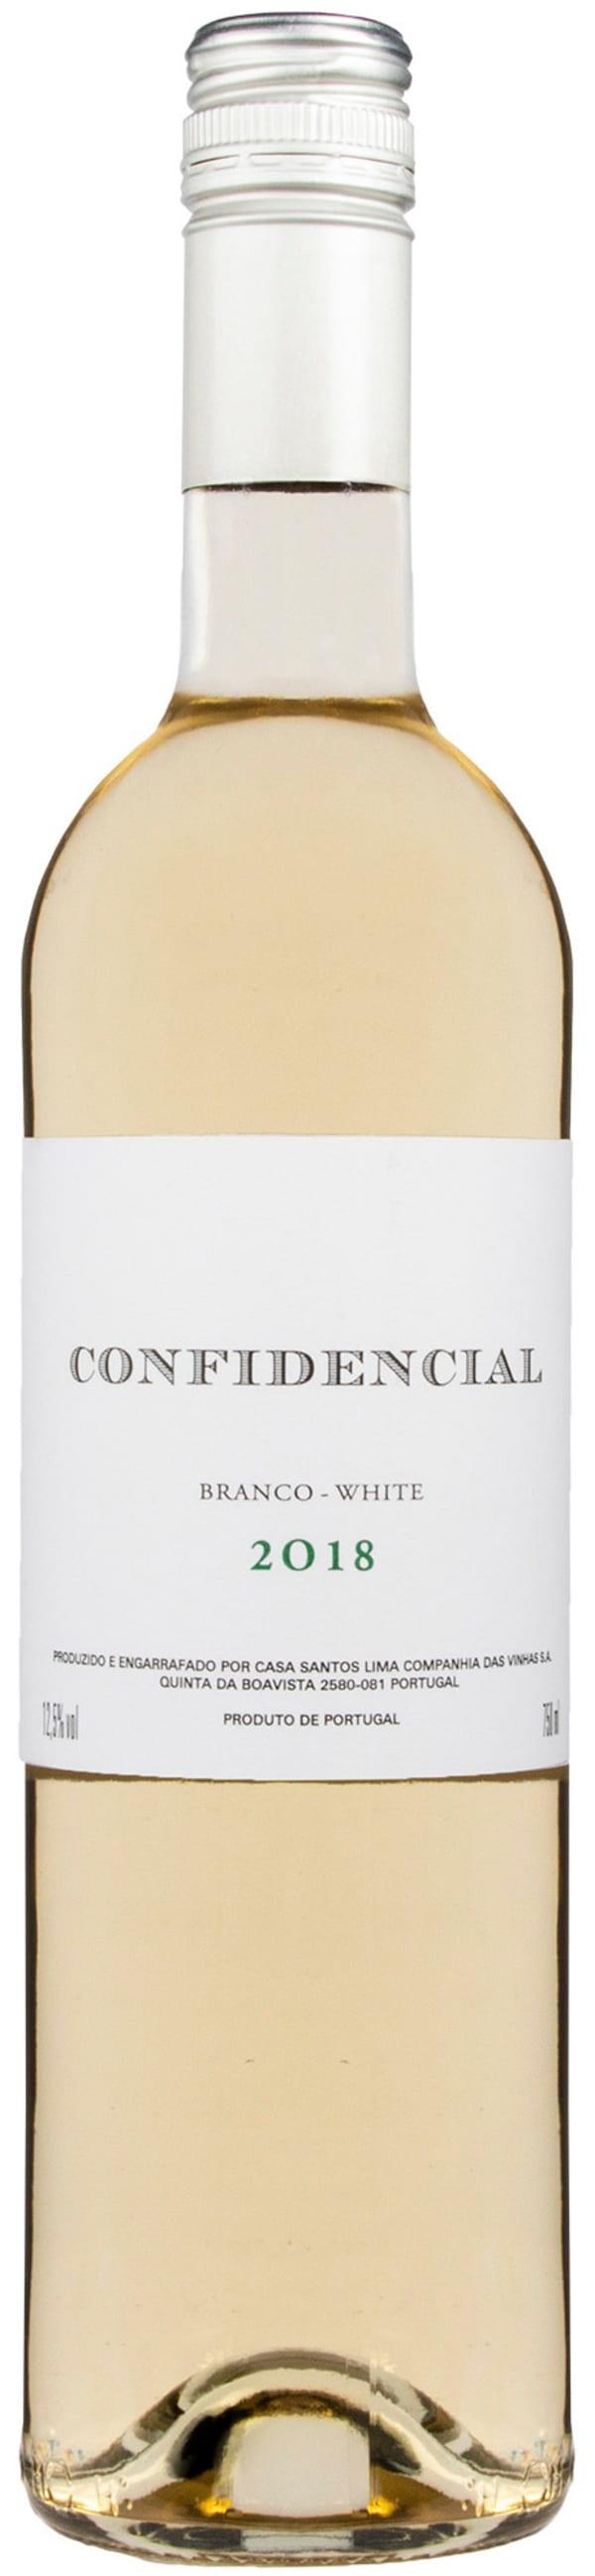 Confidencial Branco White 2018